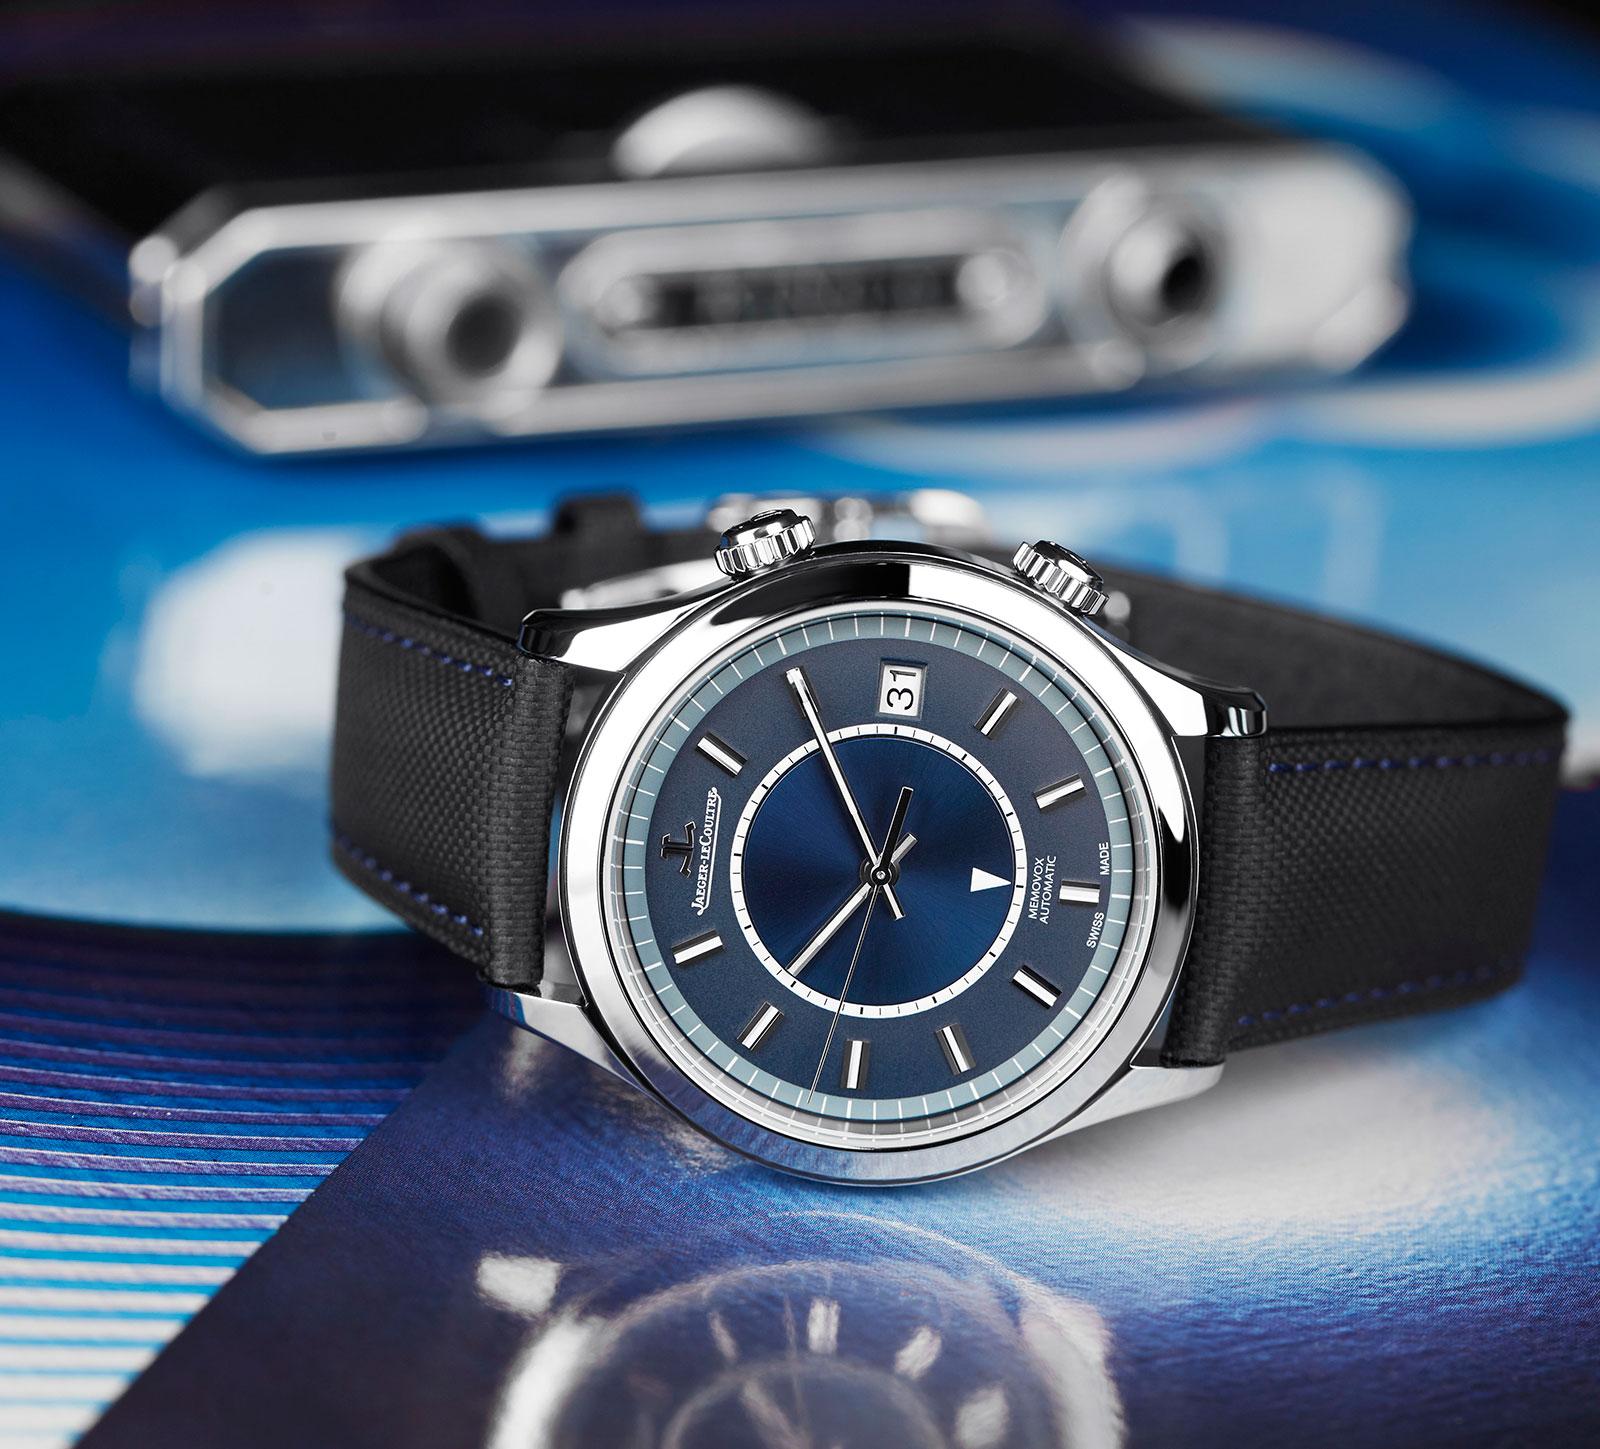 Jaeger-LeCoultre Master Memovox Boutique Edition Blue Dial 1